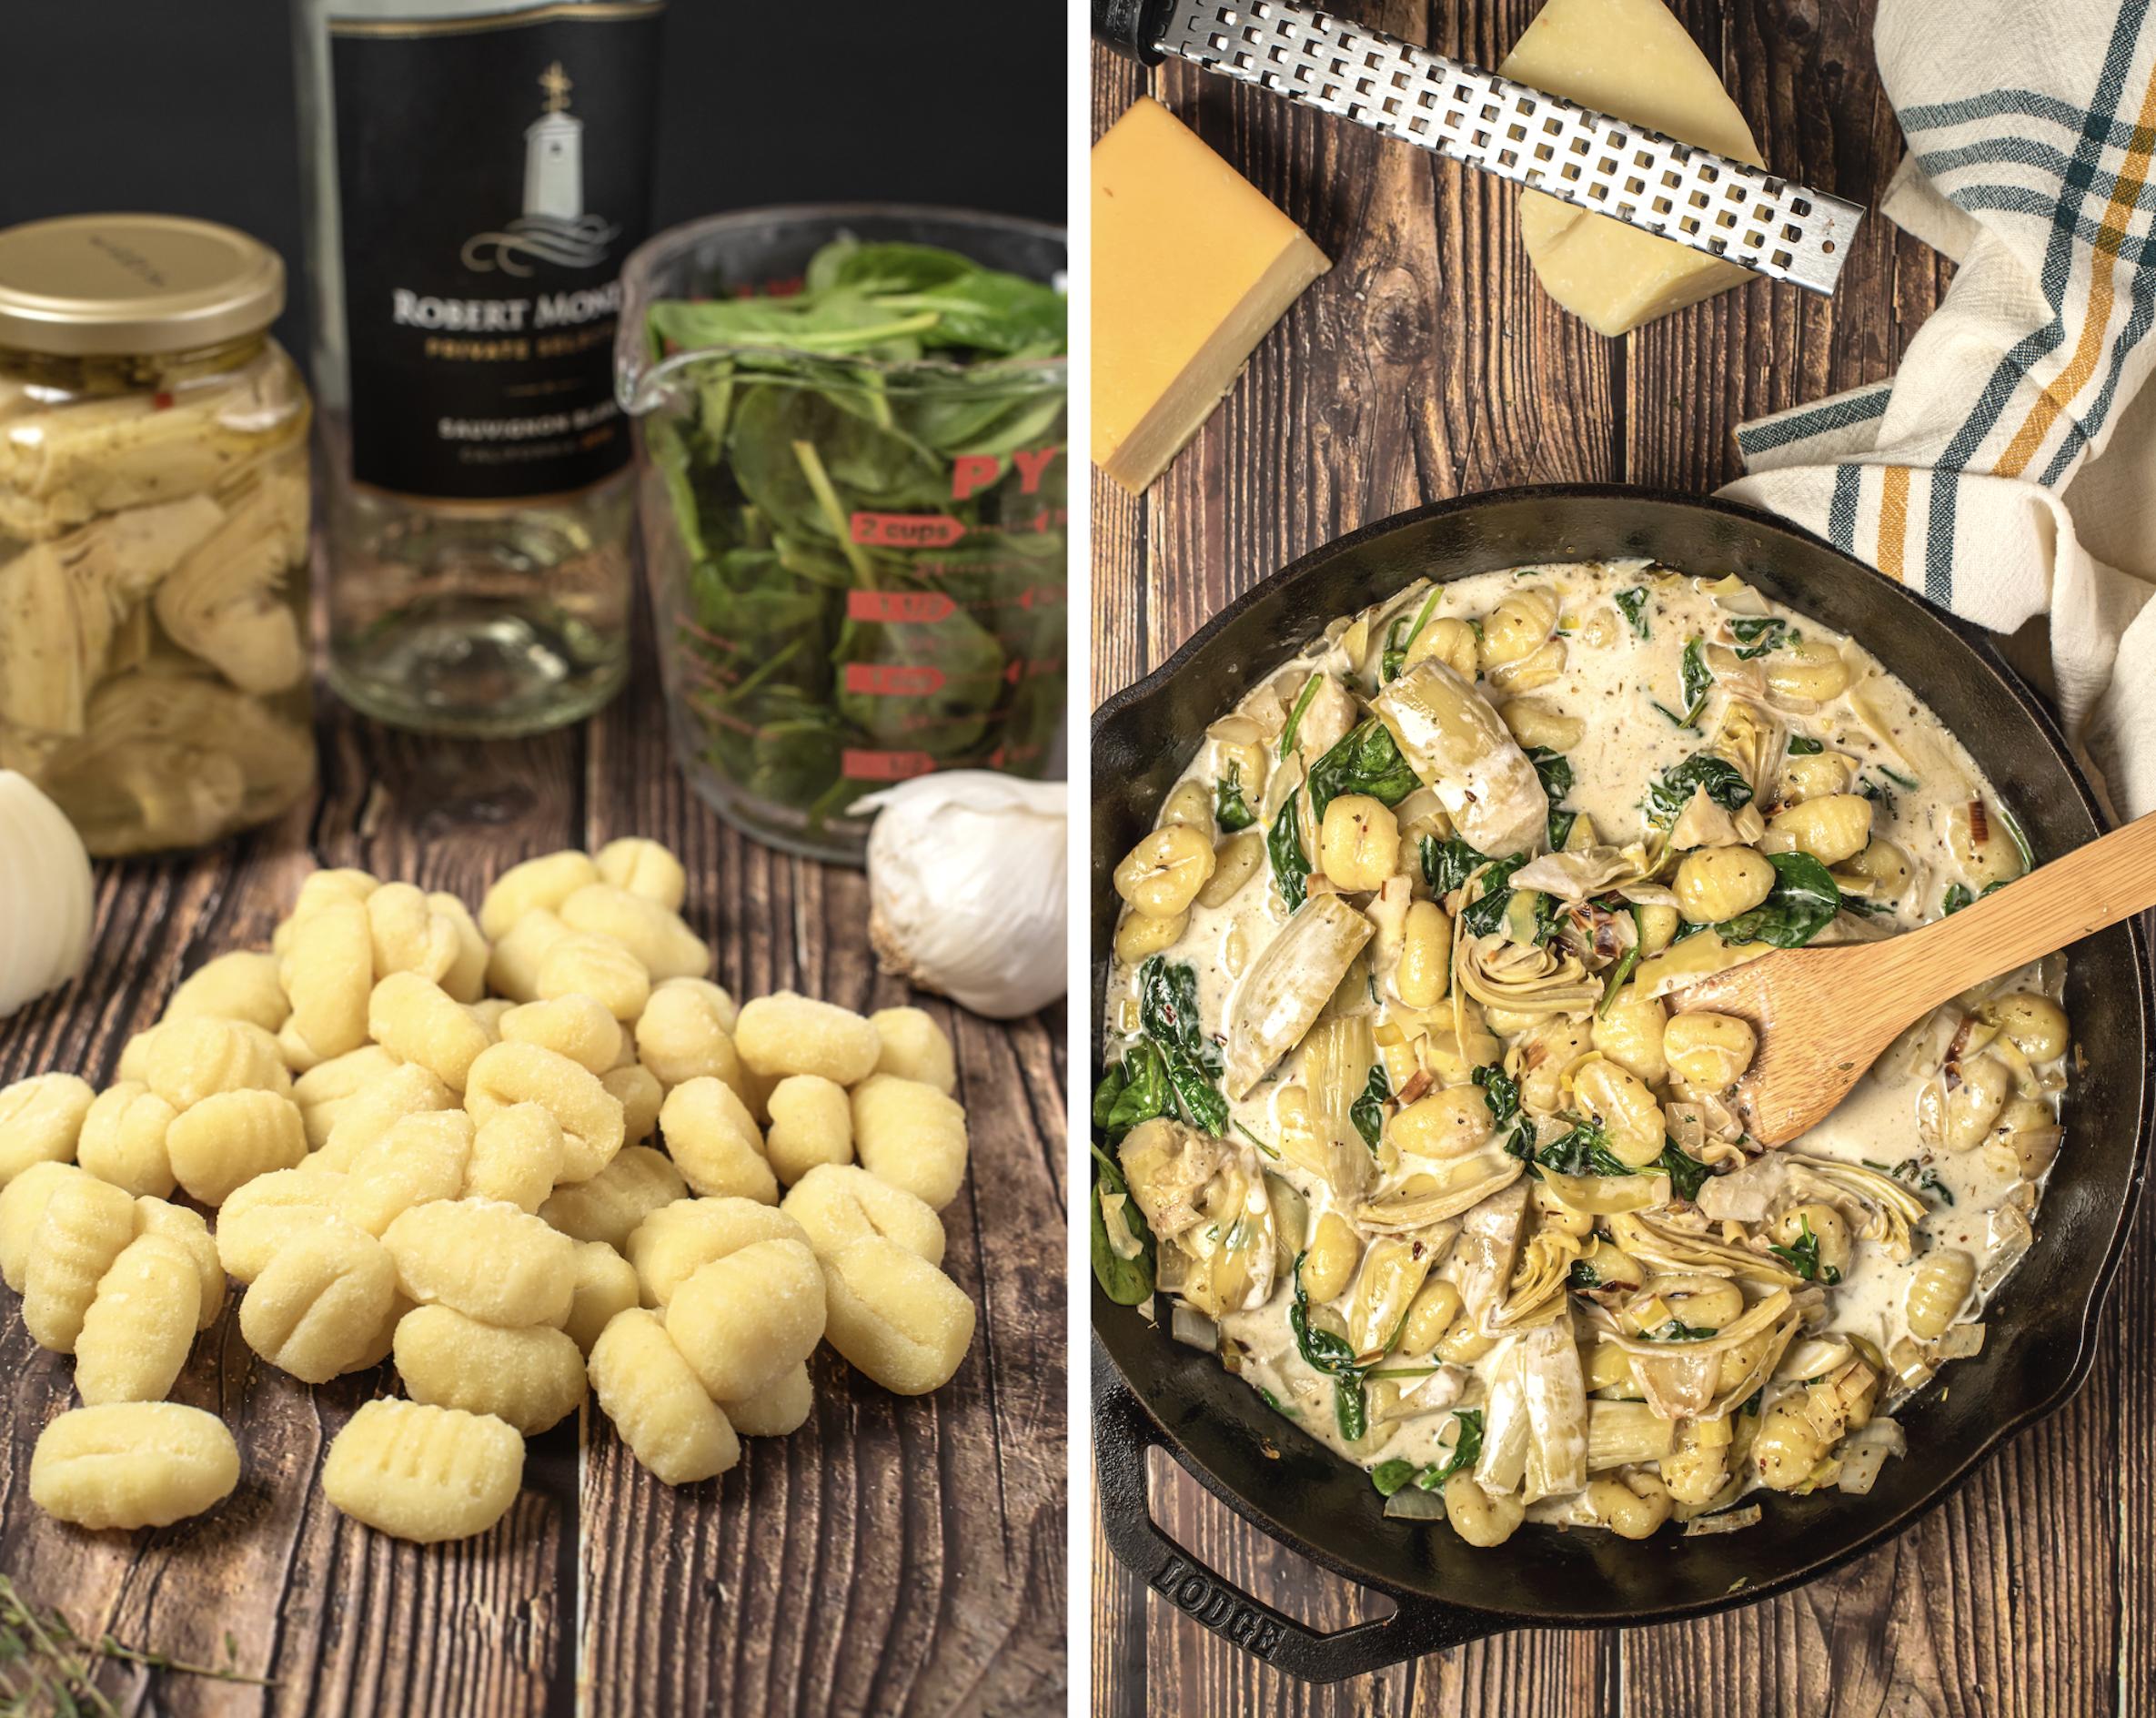 baked gnocchi ingredients